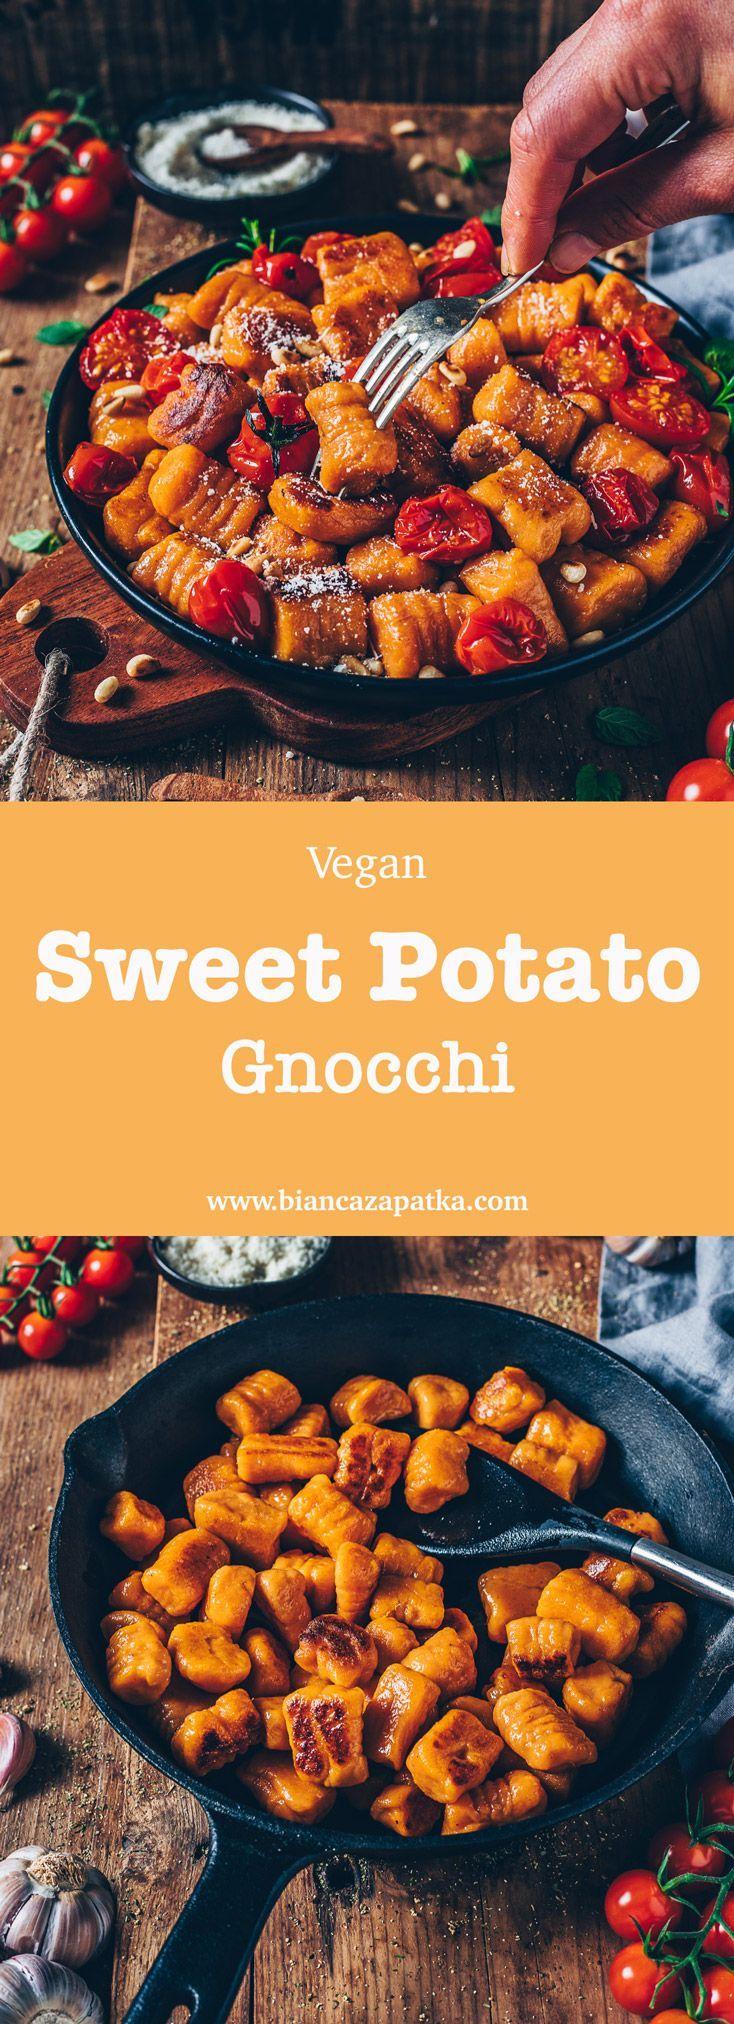 Sweet Potato Gnocchi (vegan, easy – Chelsea Wissink